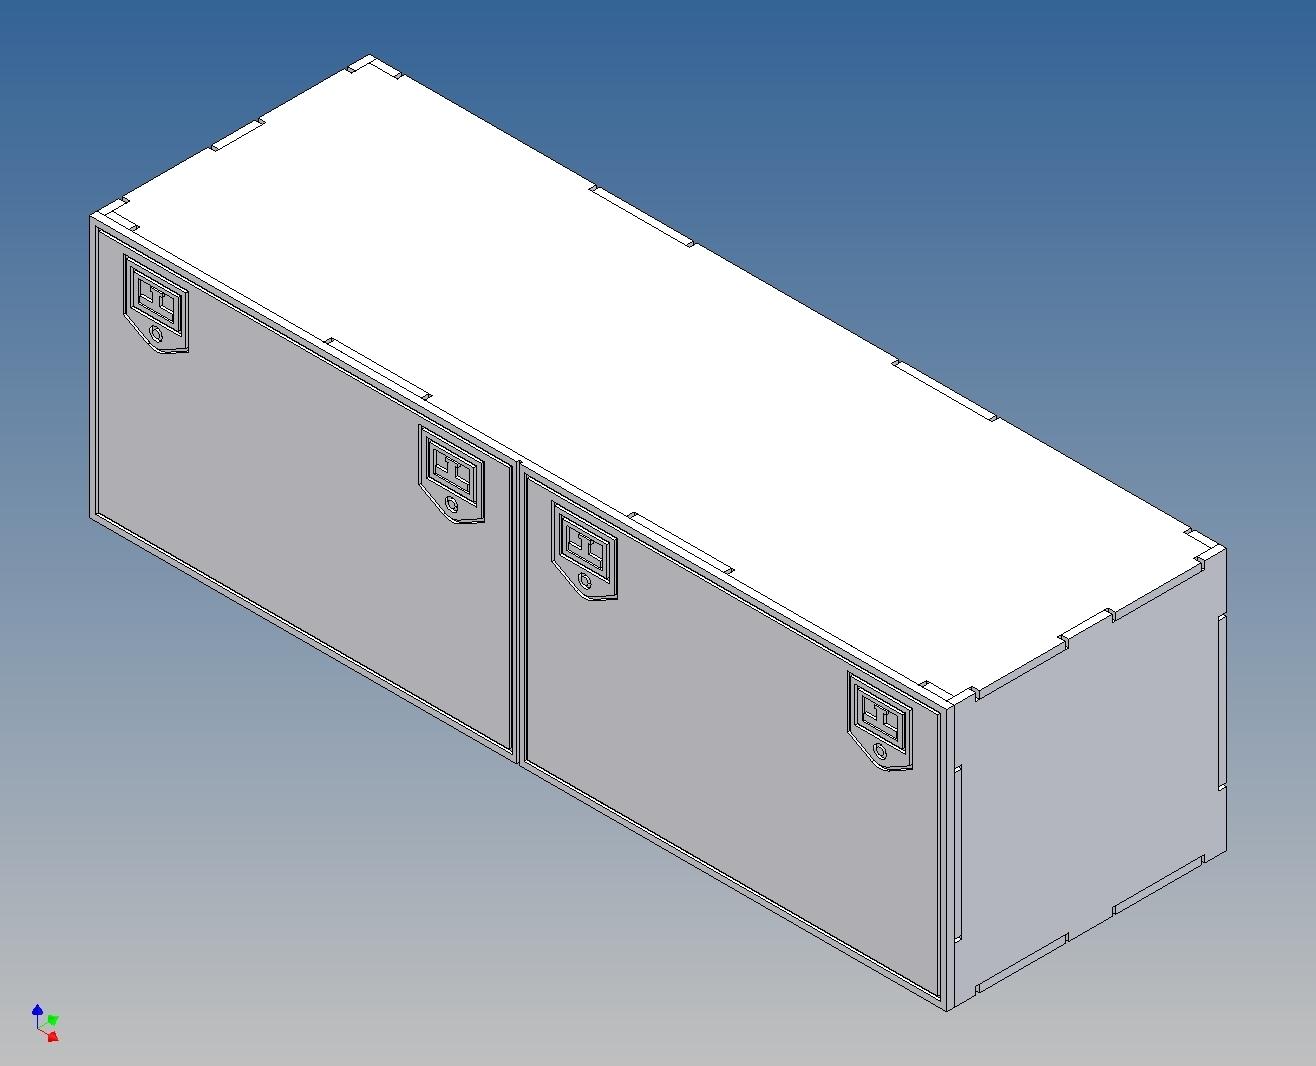 staubox f r tamiya lkw m1 14 170 lang x 52 hoch x 56. Black Bedroom Furniture Sets. Home Design Ideas